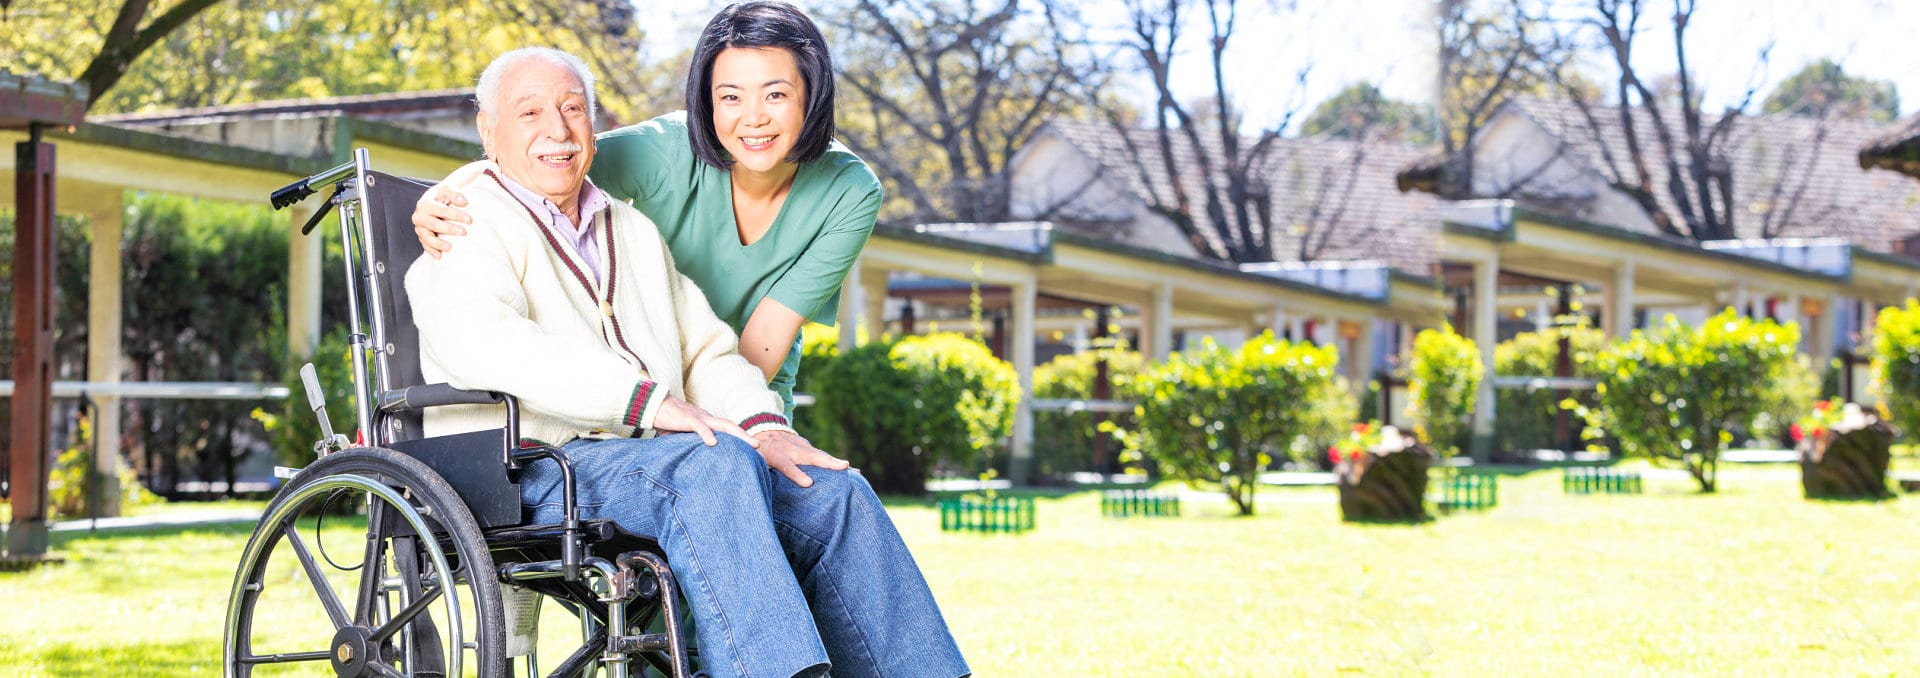 portrait of caregiver and senior man